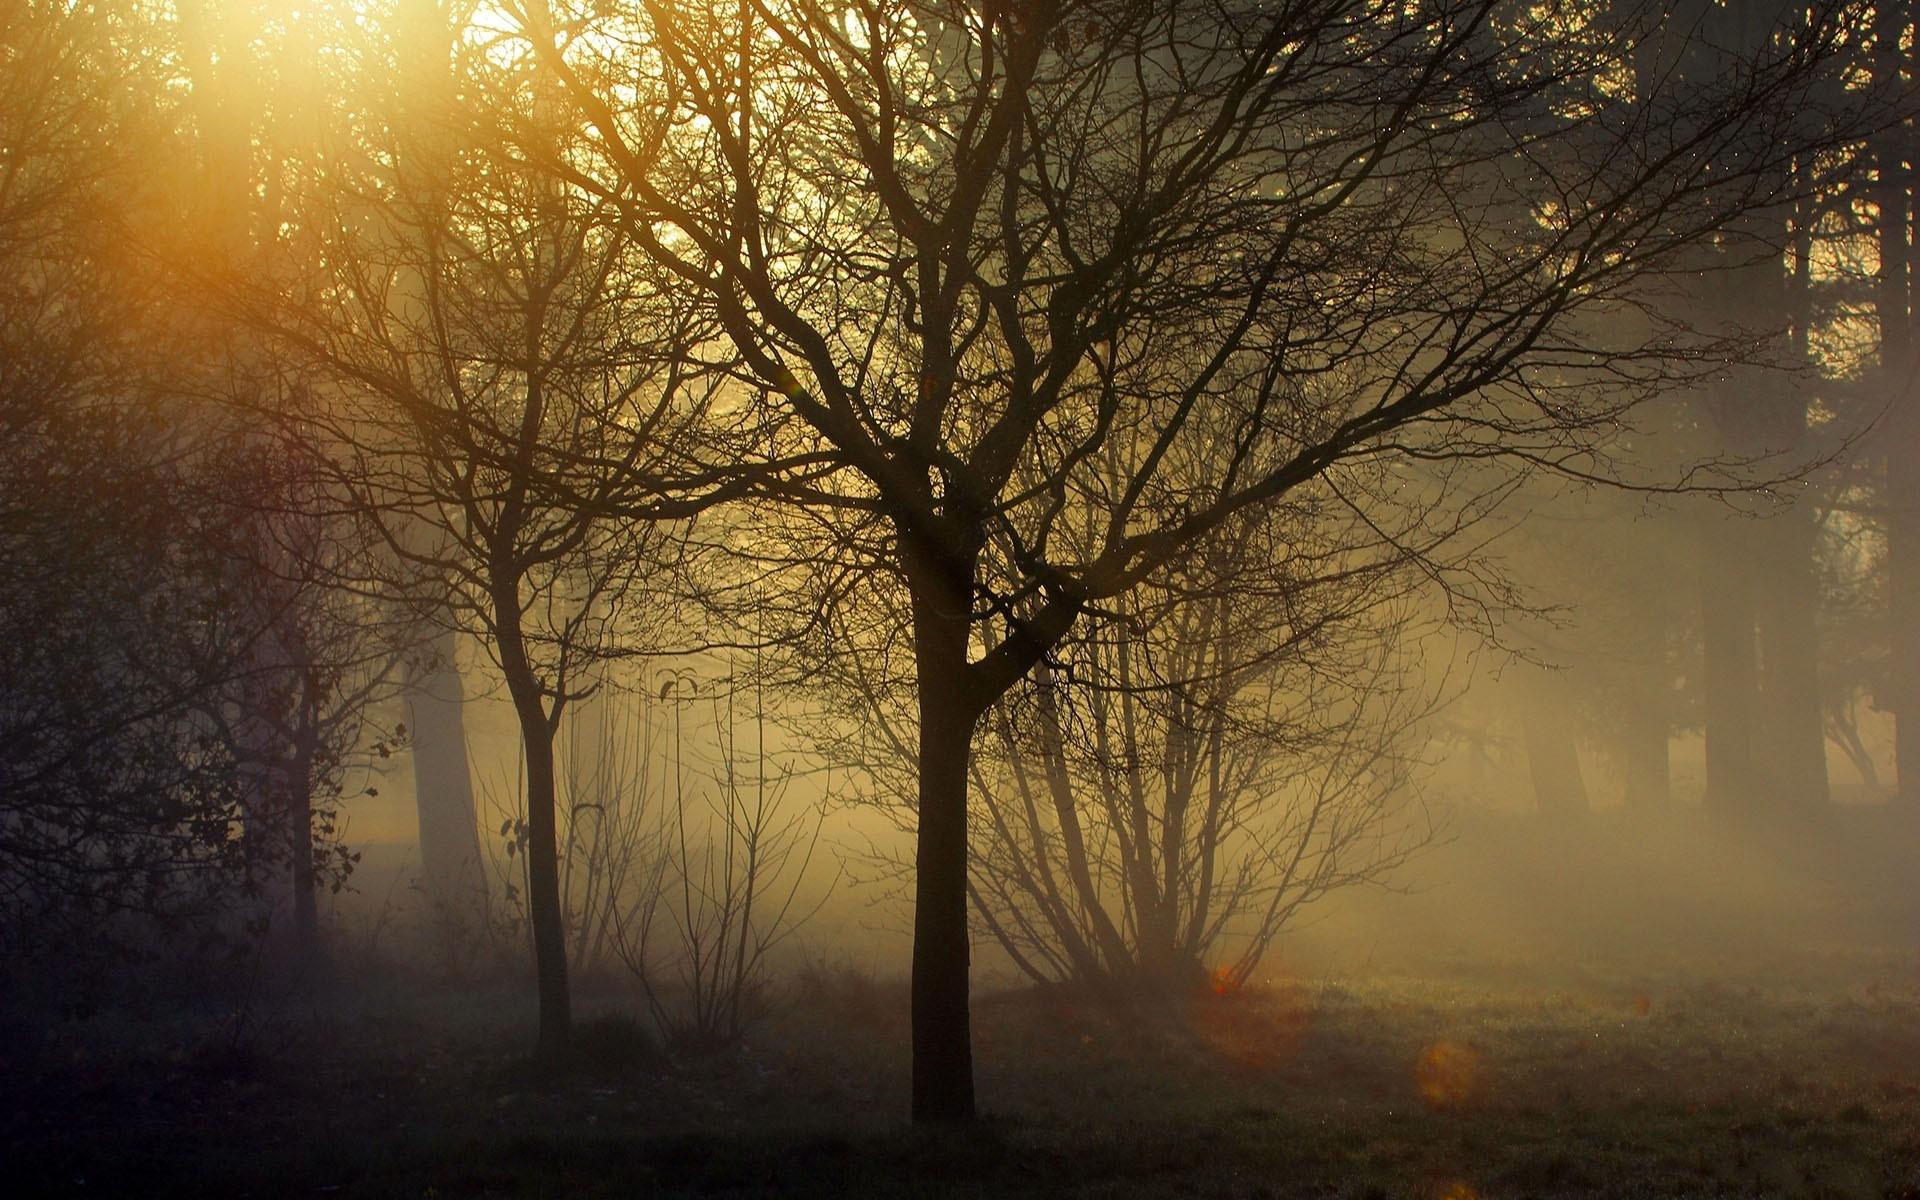 landscapes trees fog - photo #42